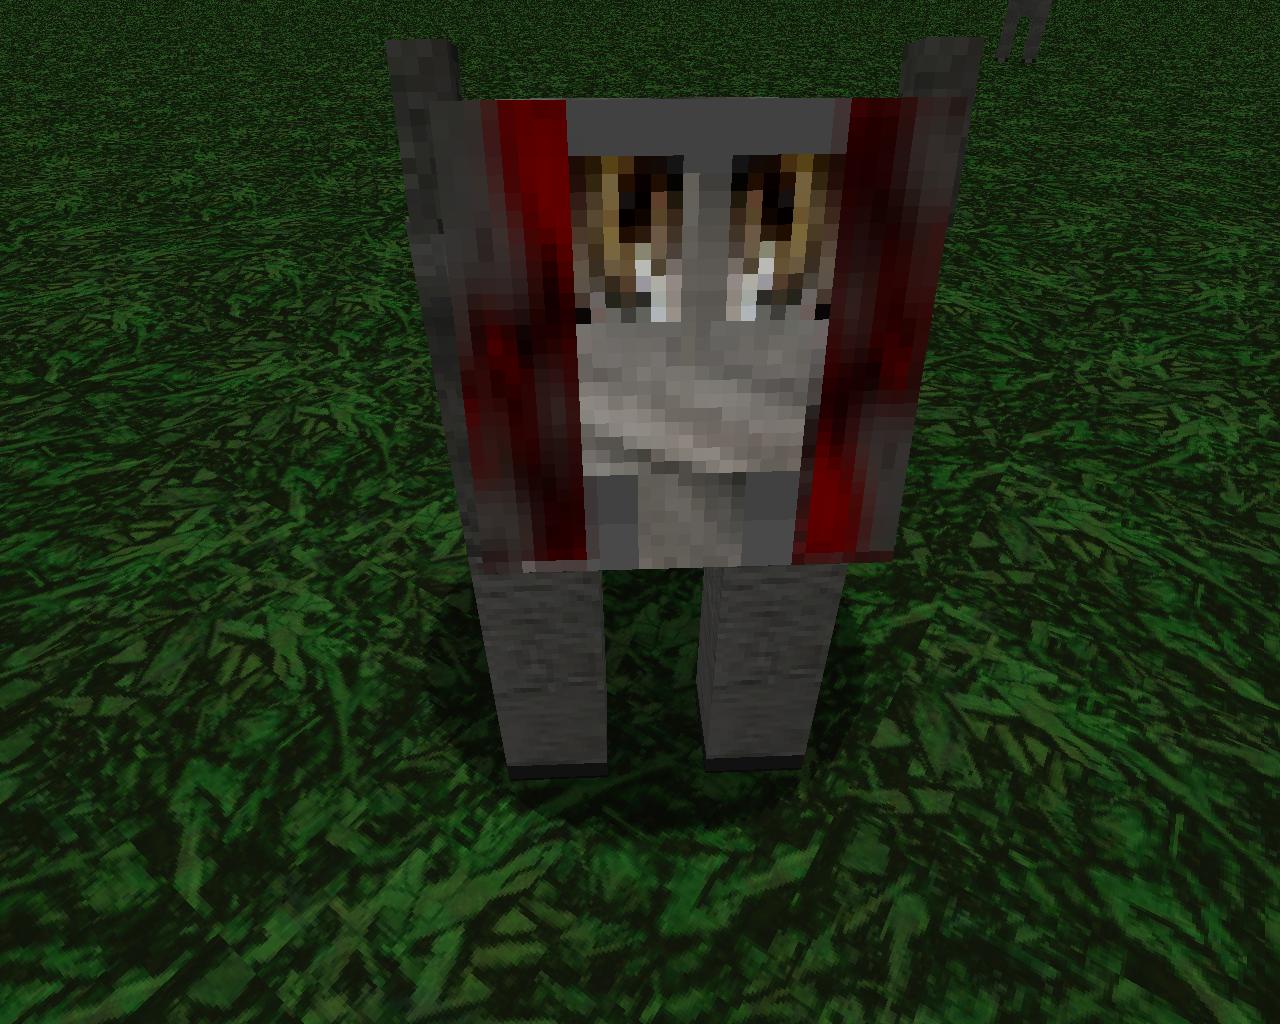 Minecraft scp texture pack